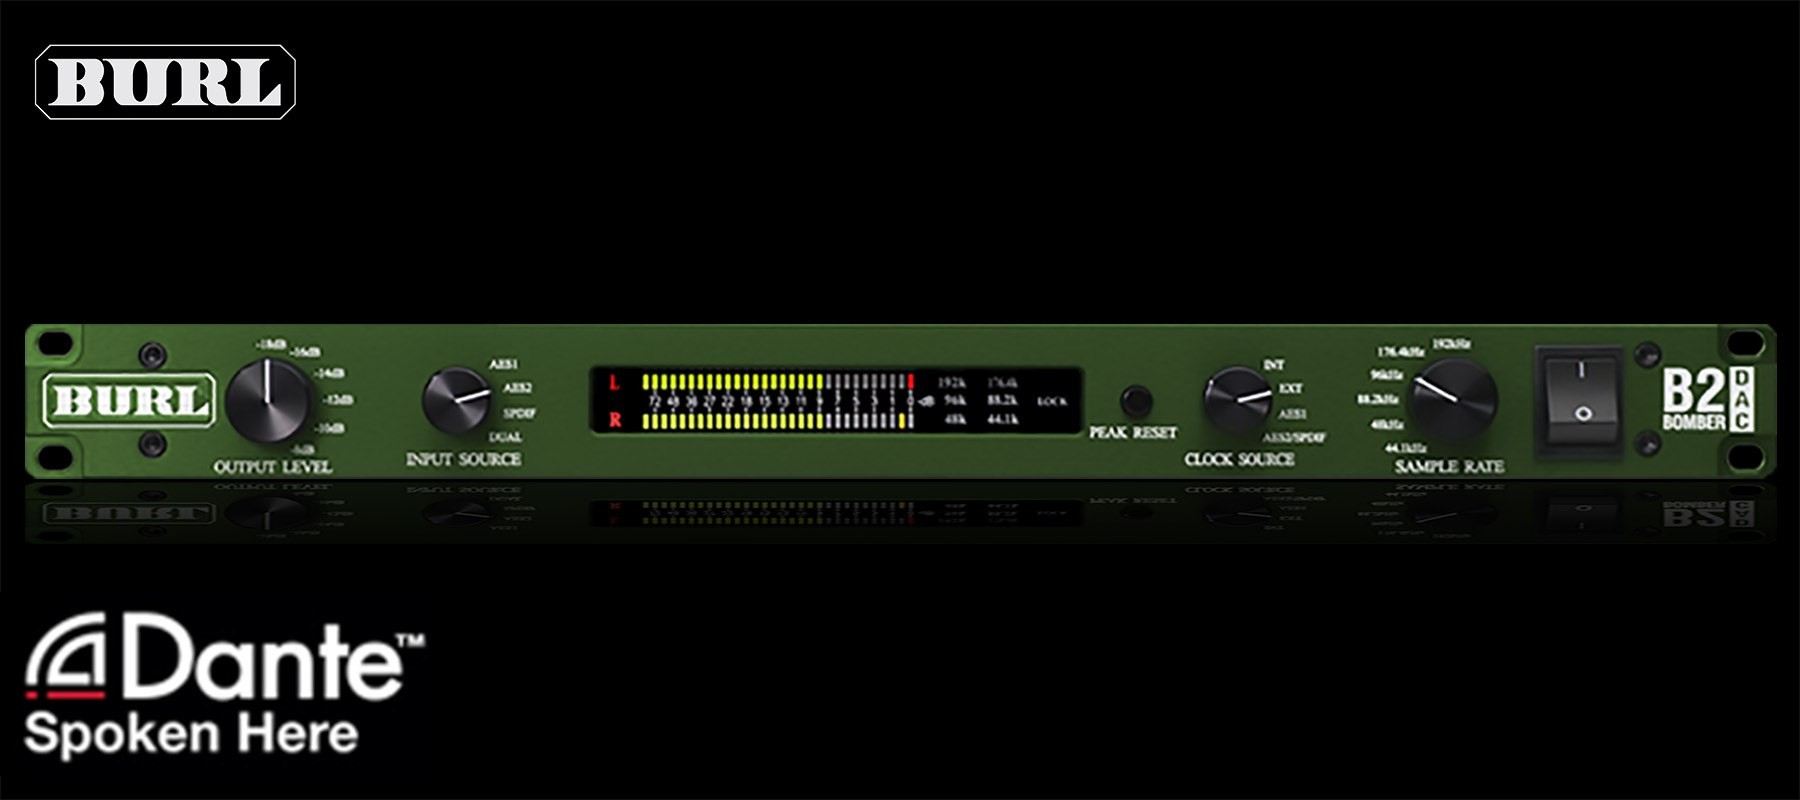 Burl Audio B2 Bomber DAC Dante Front